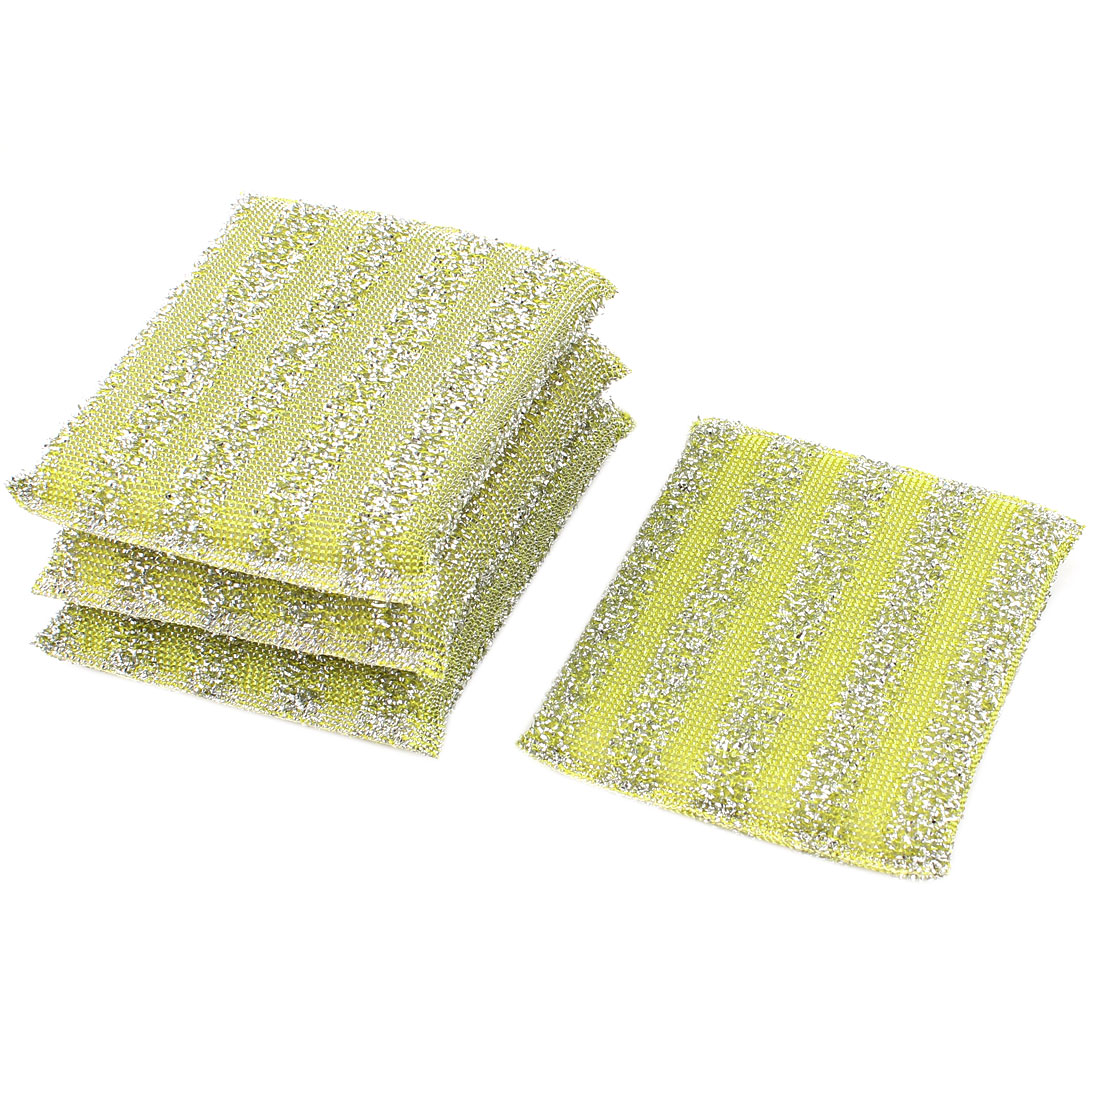 Home Kitchen Bowl Dish Pot Wash Clean Scrub Sponge Cleaning Pads Yellow 4pcs